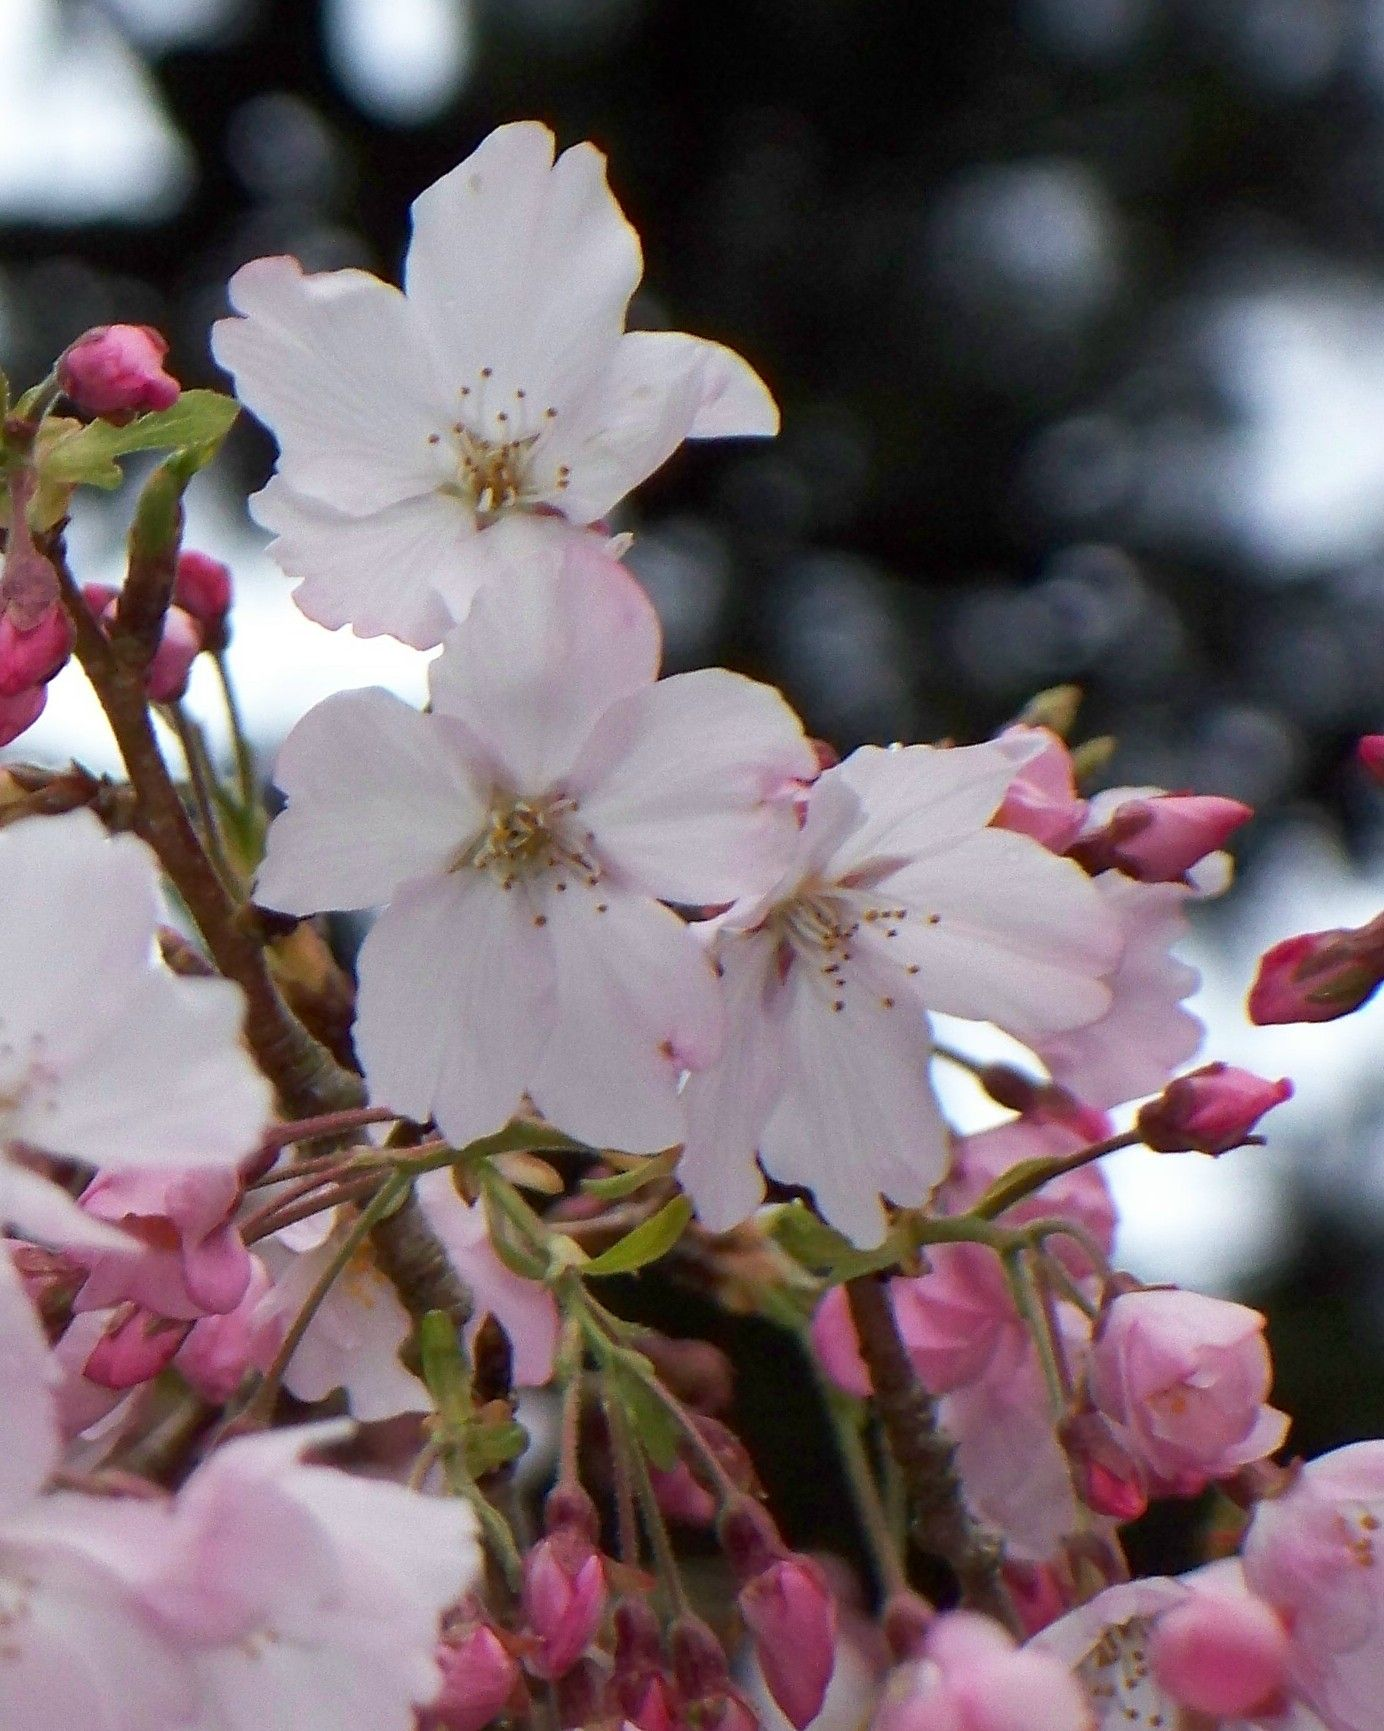 Spring Cherry Blossoms: Peak Bloom Cherry Tree Flowers